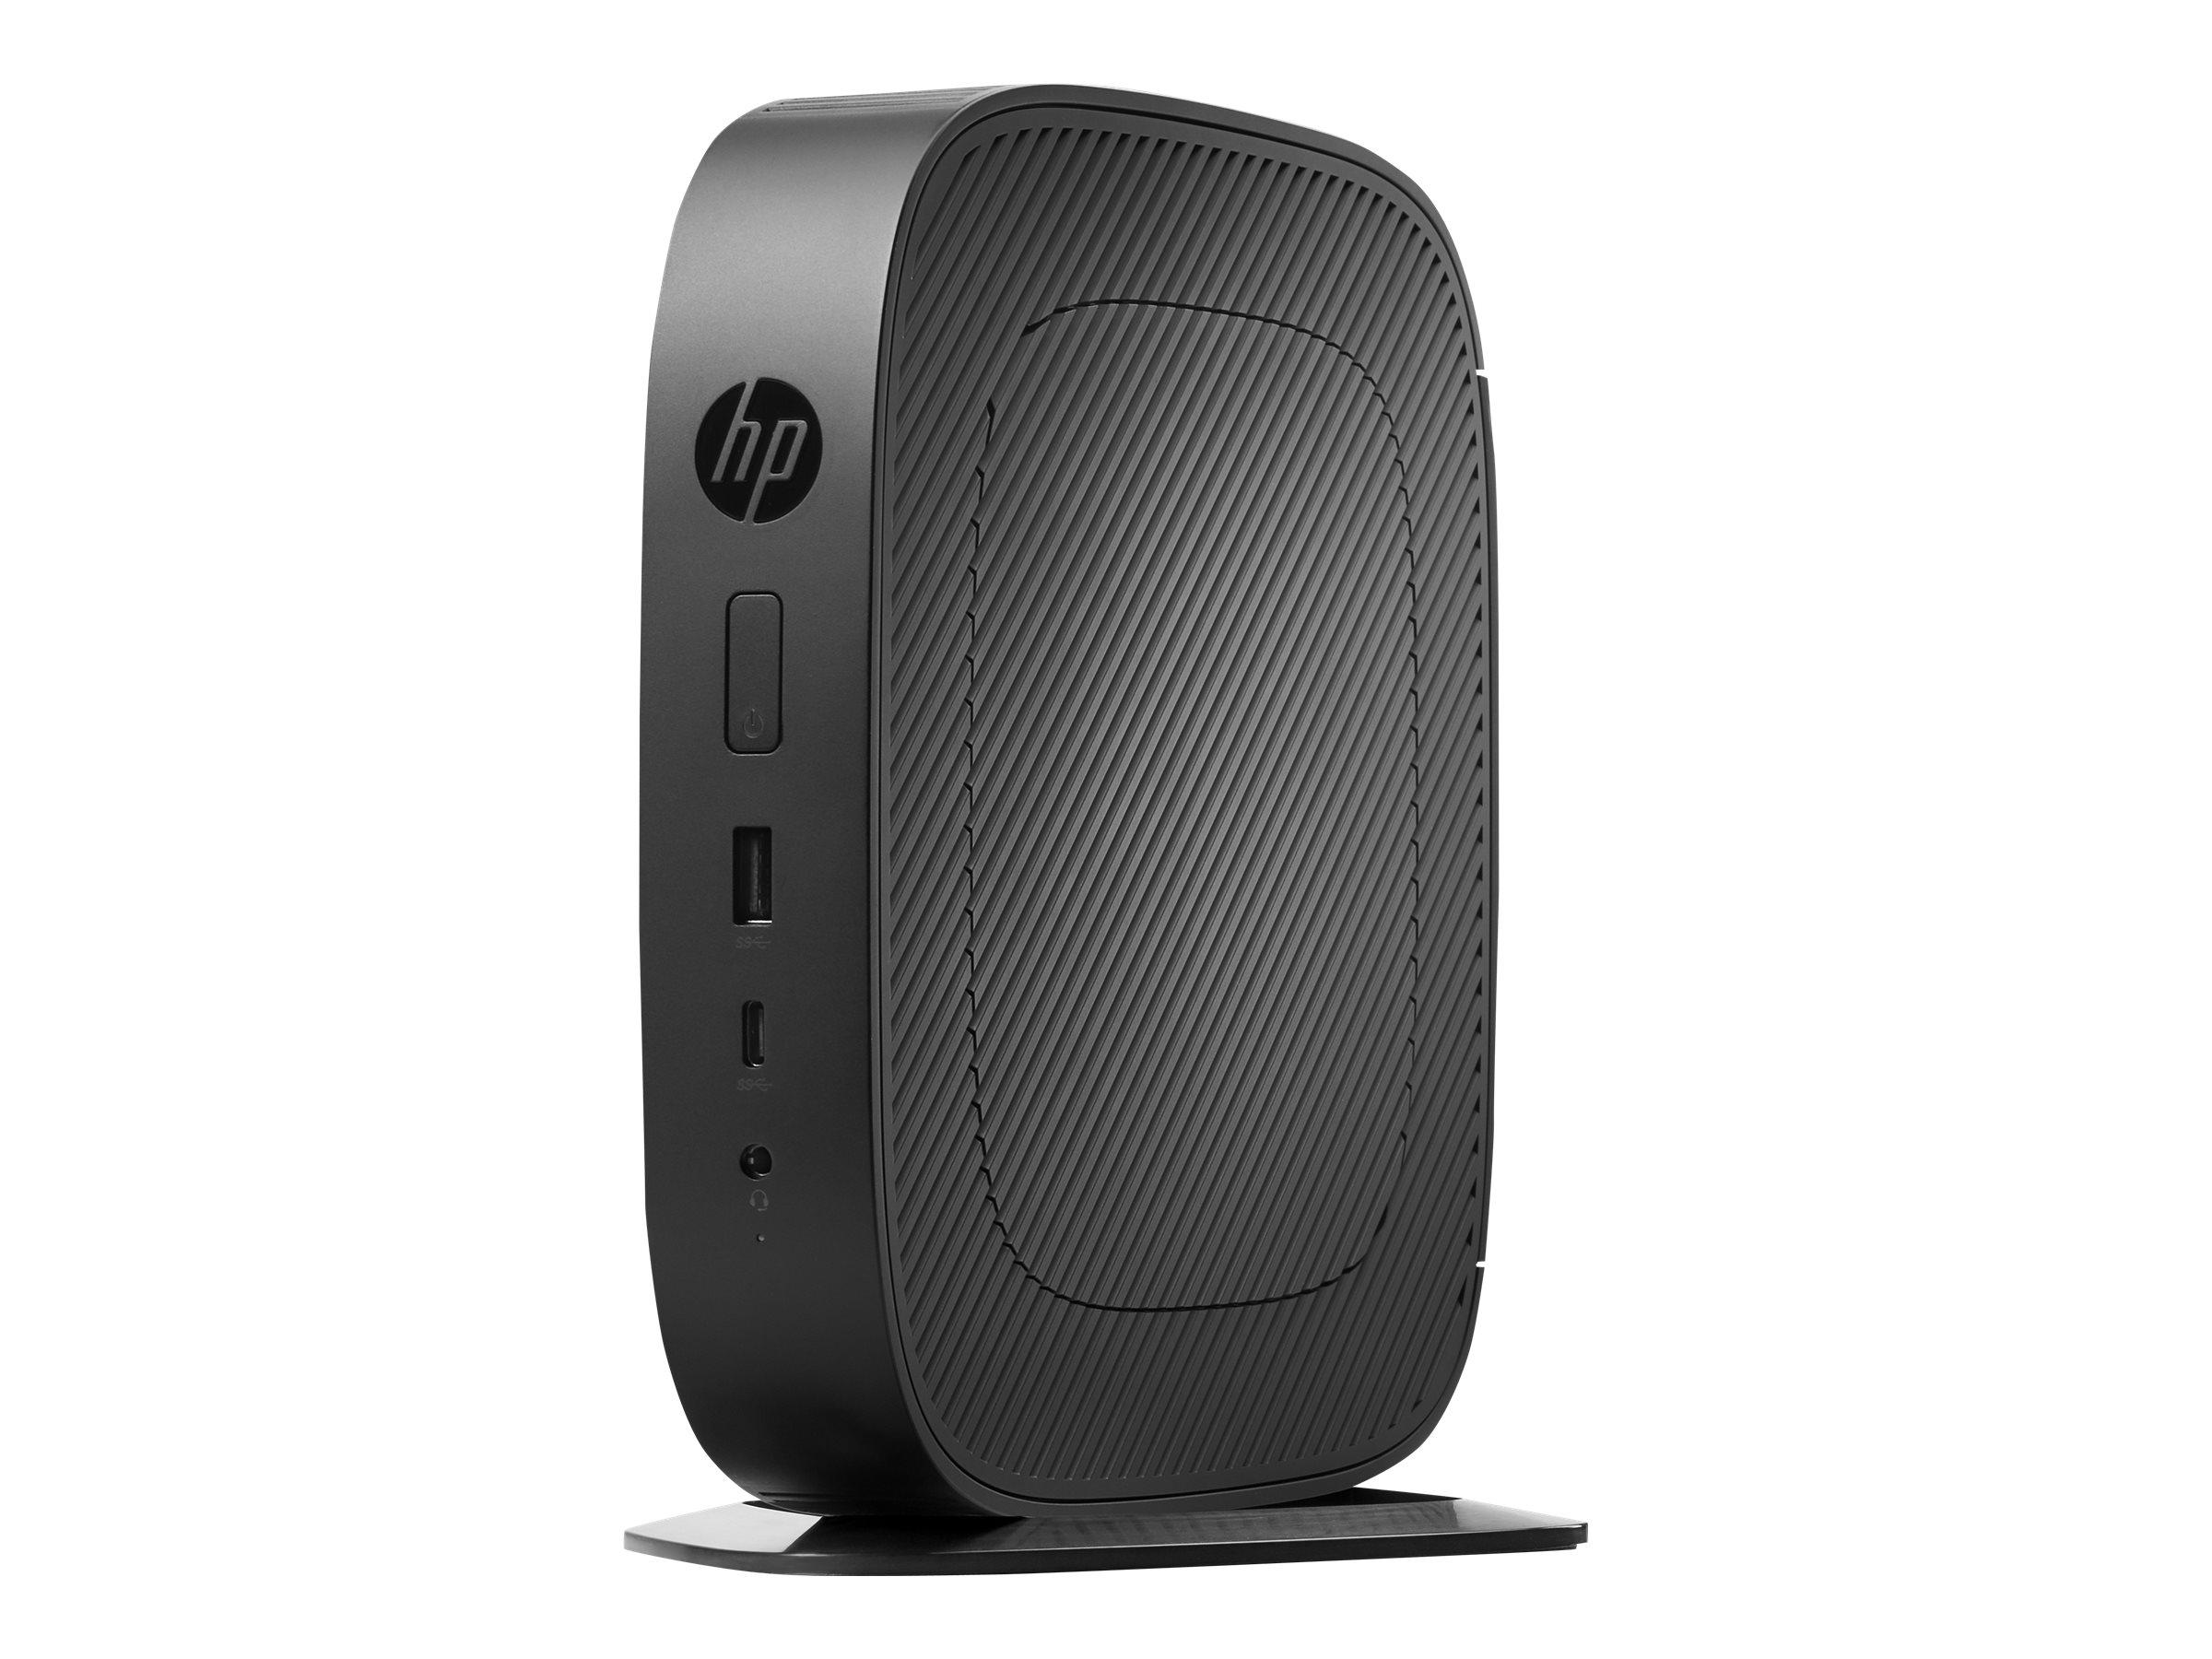 HP t530 - Thin Client - Tower - 1 x GX-215JJ 1.5 GHz RAM 8 GB - Flash 32 GB - Radeon R2E - GigE - WLAN - Bluetooth - Win 10 IOT Enterprise